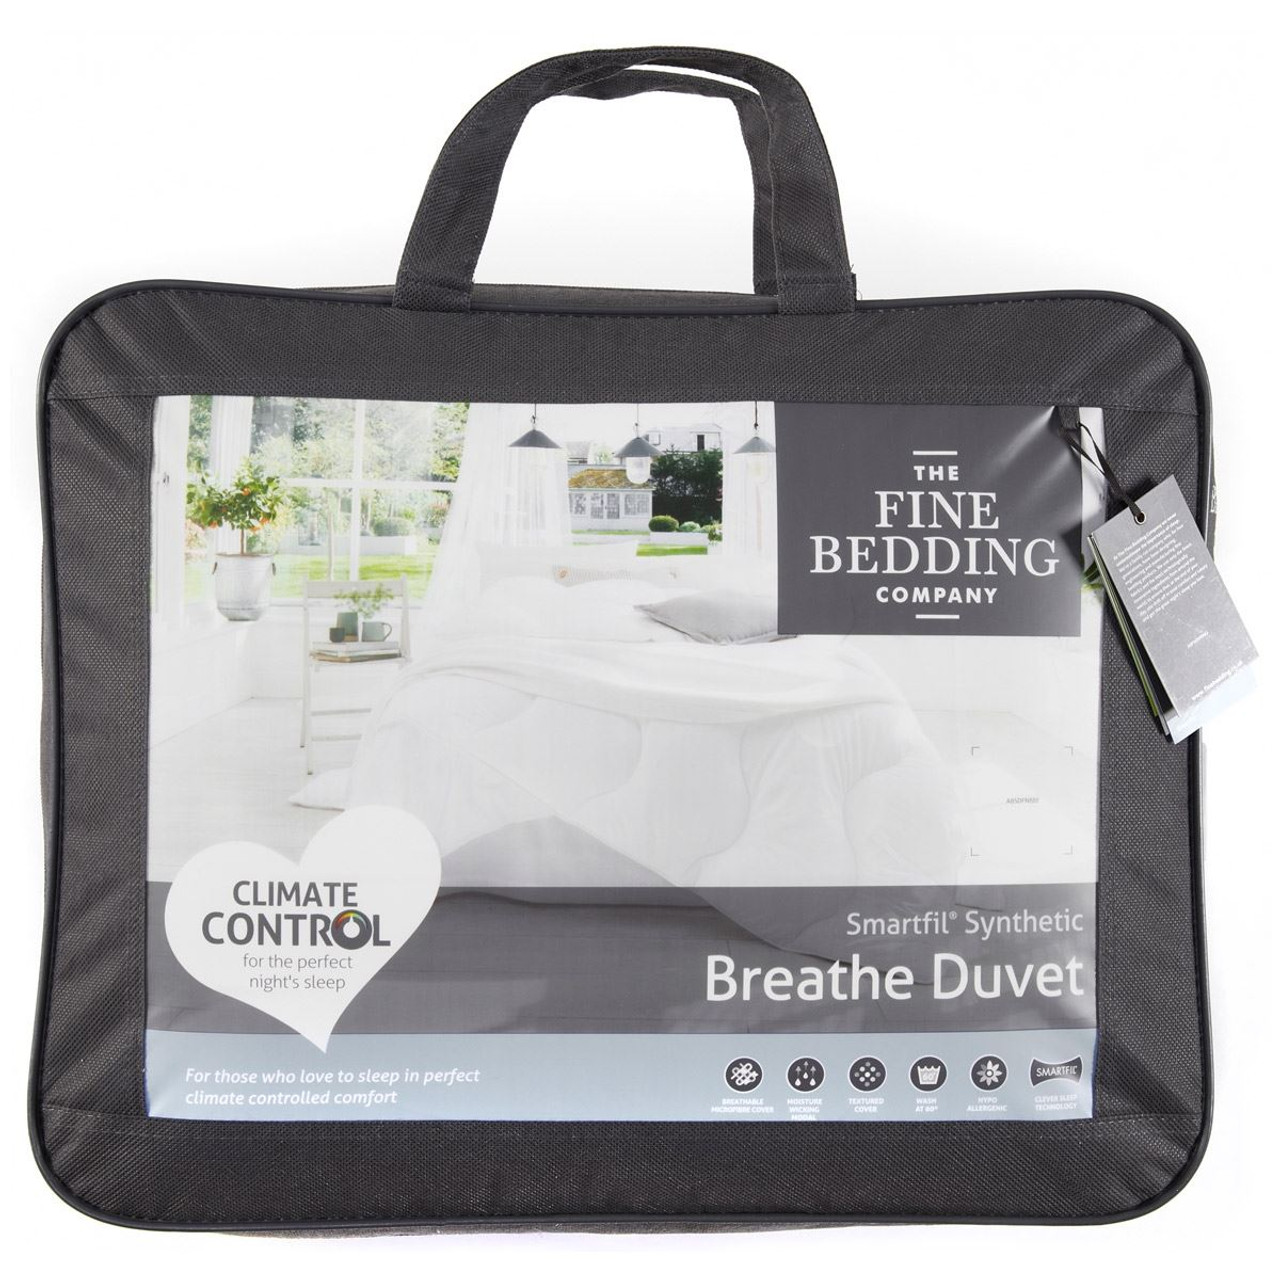 The Fine Bedding Company Breathe Duvet packaging